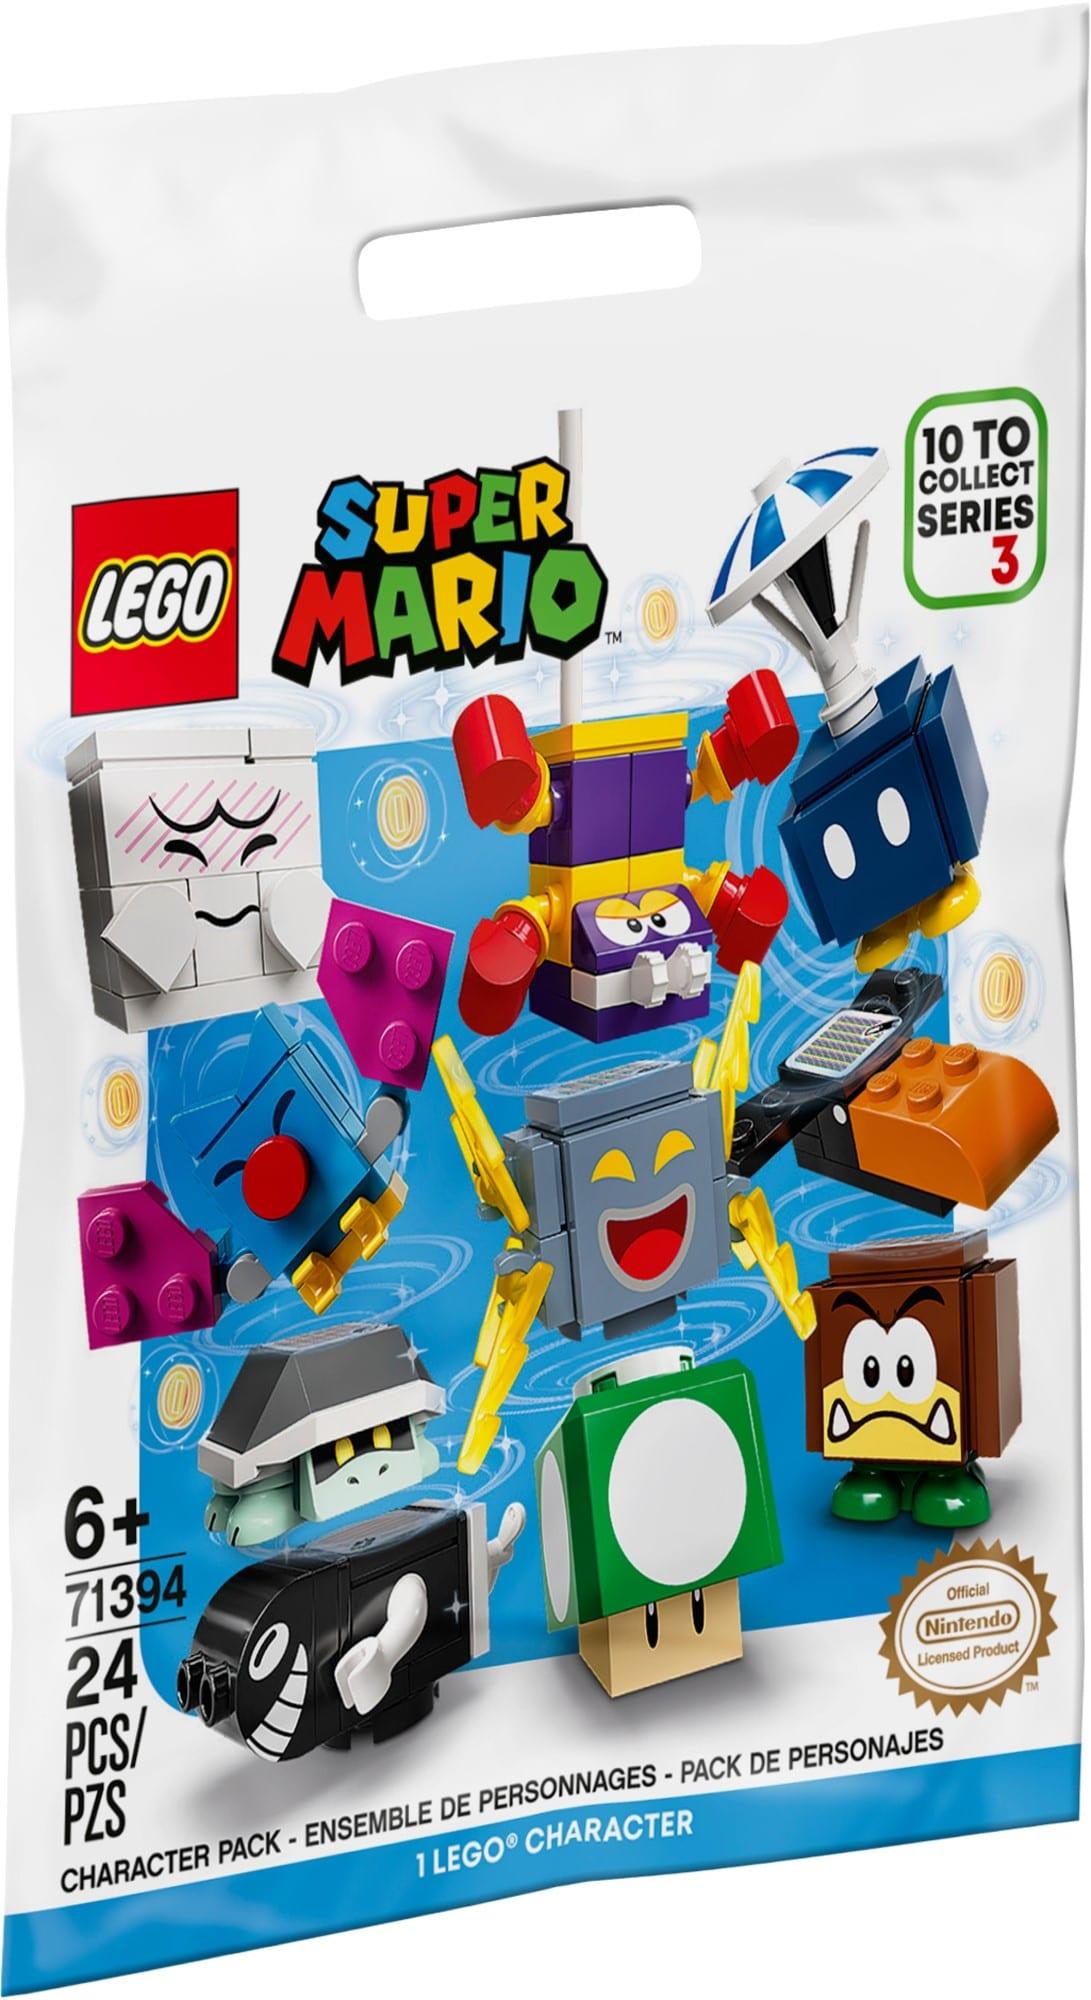 LEGO Super Mario 71394 Character Packs Series 3 2